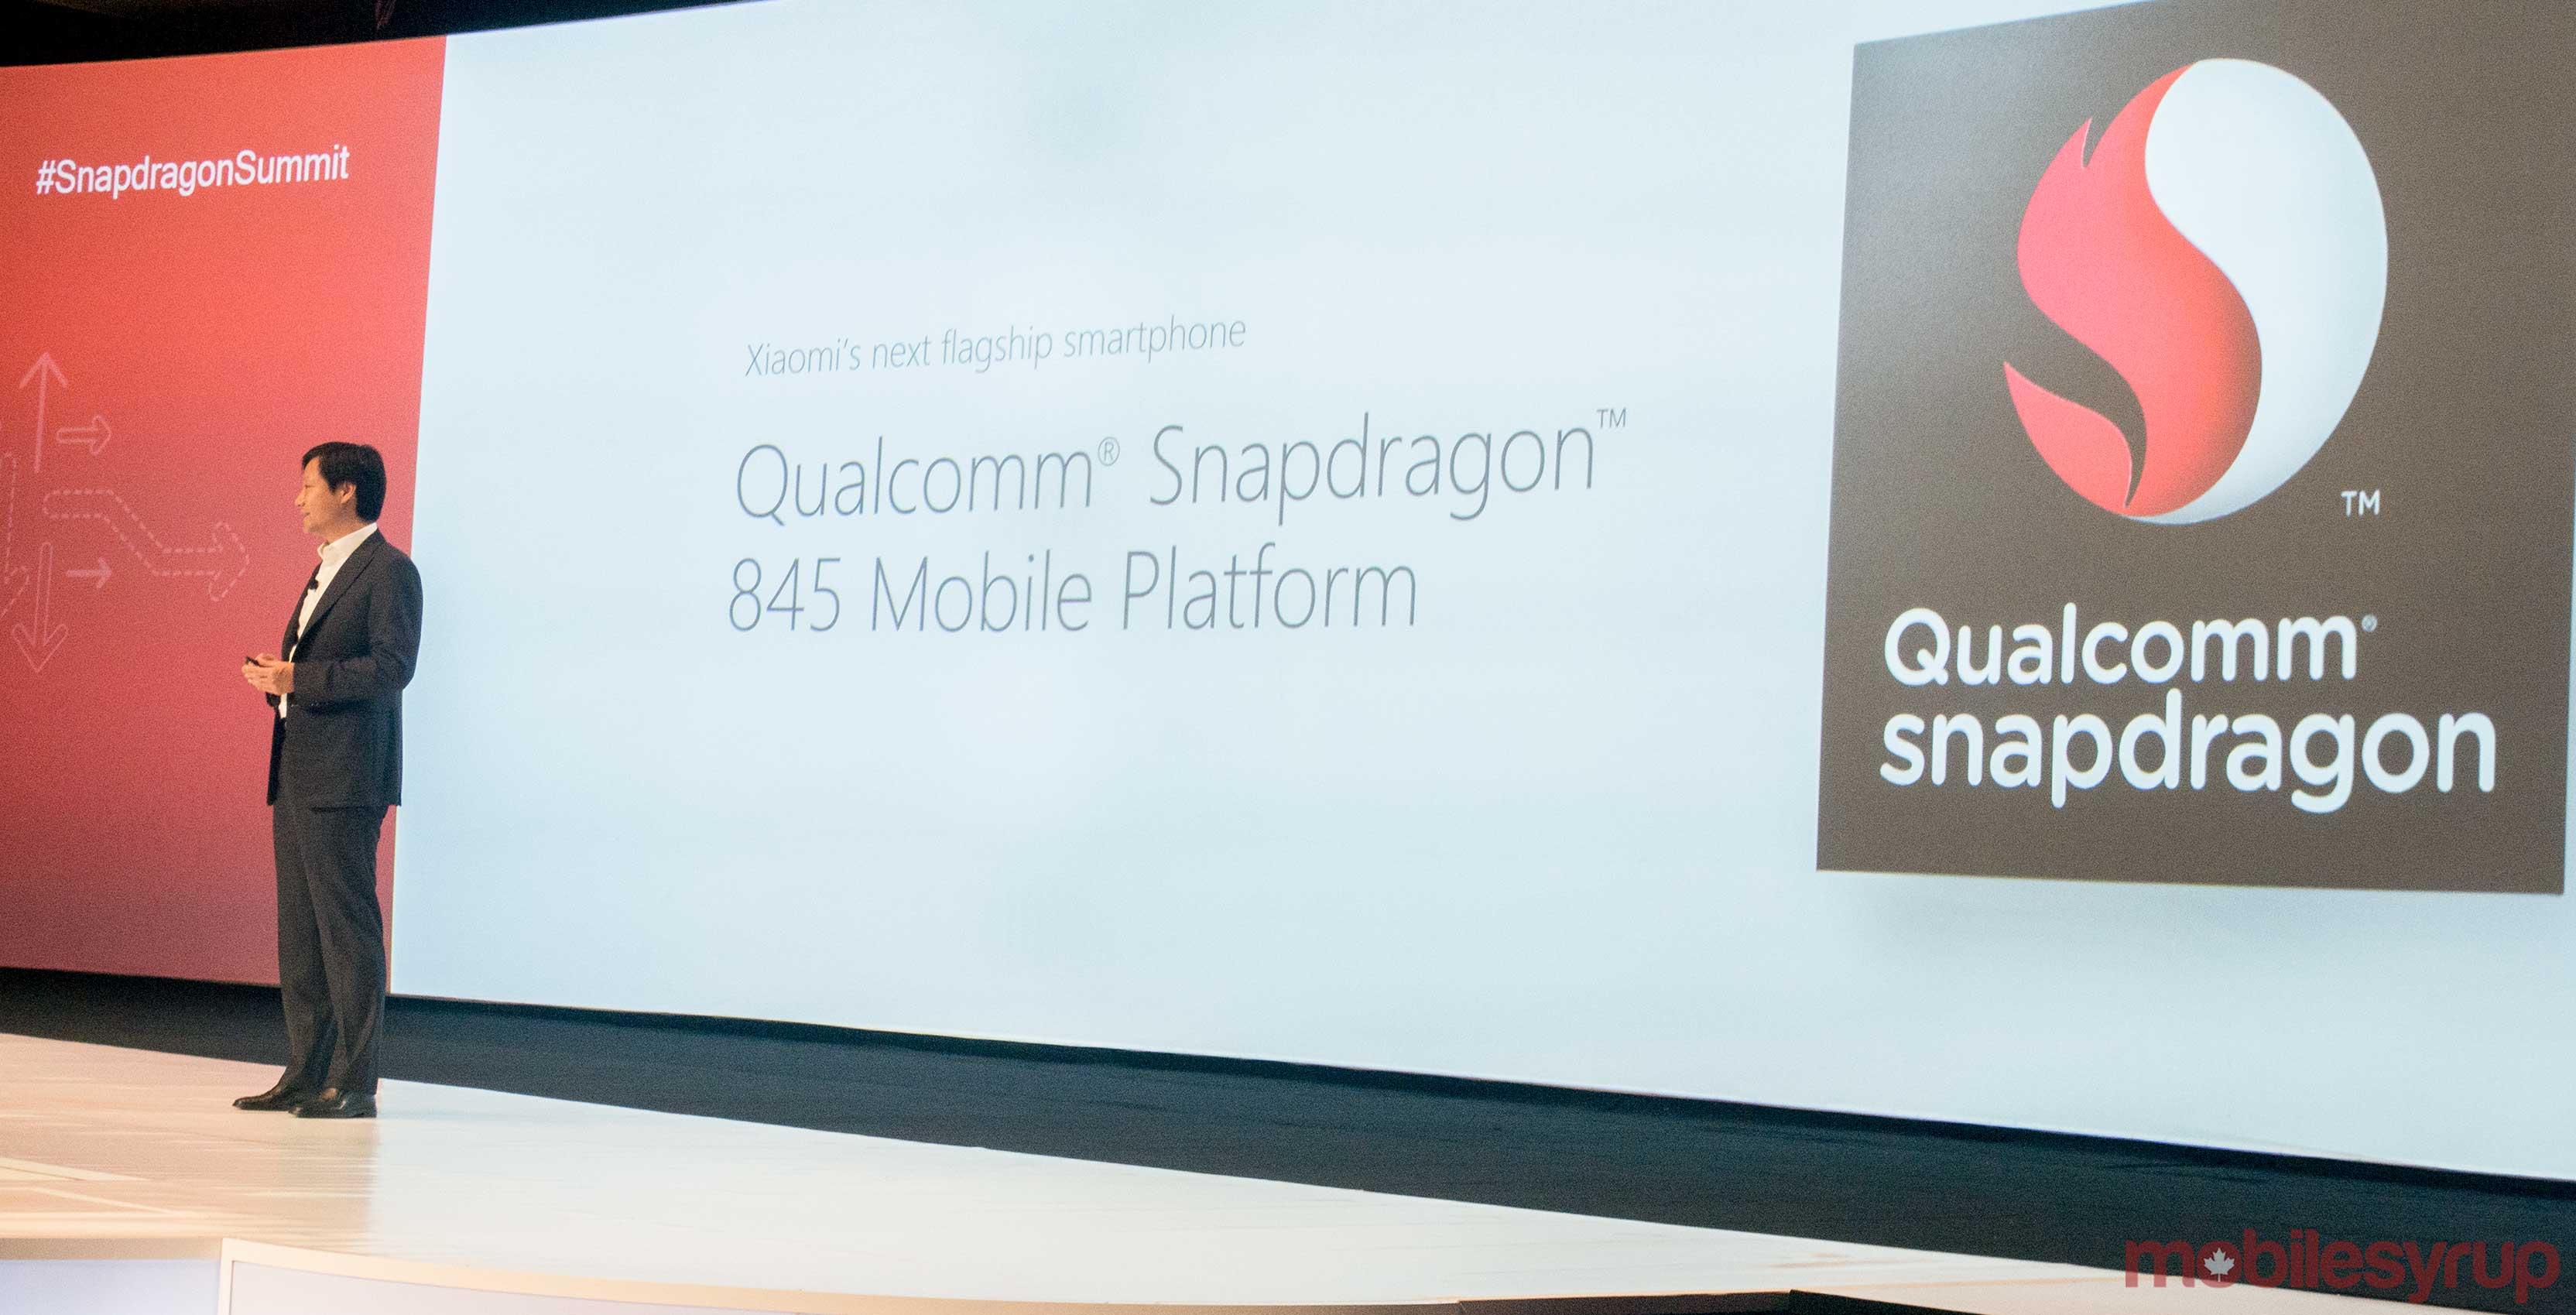 Snapdragon conference Xiaomi